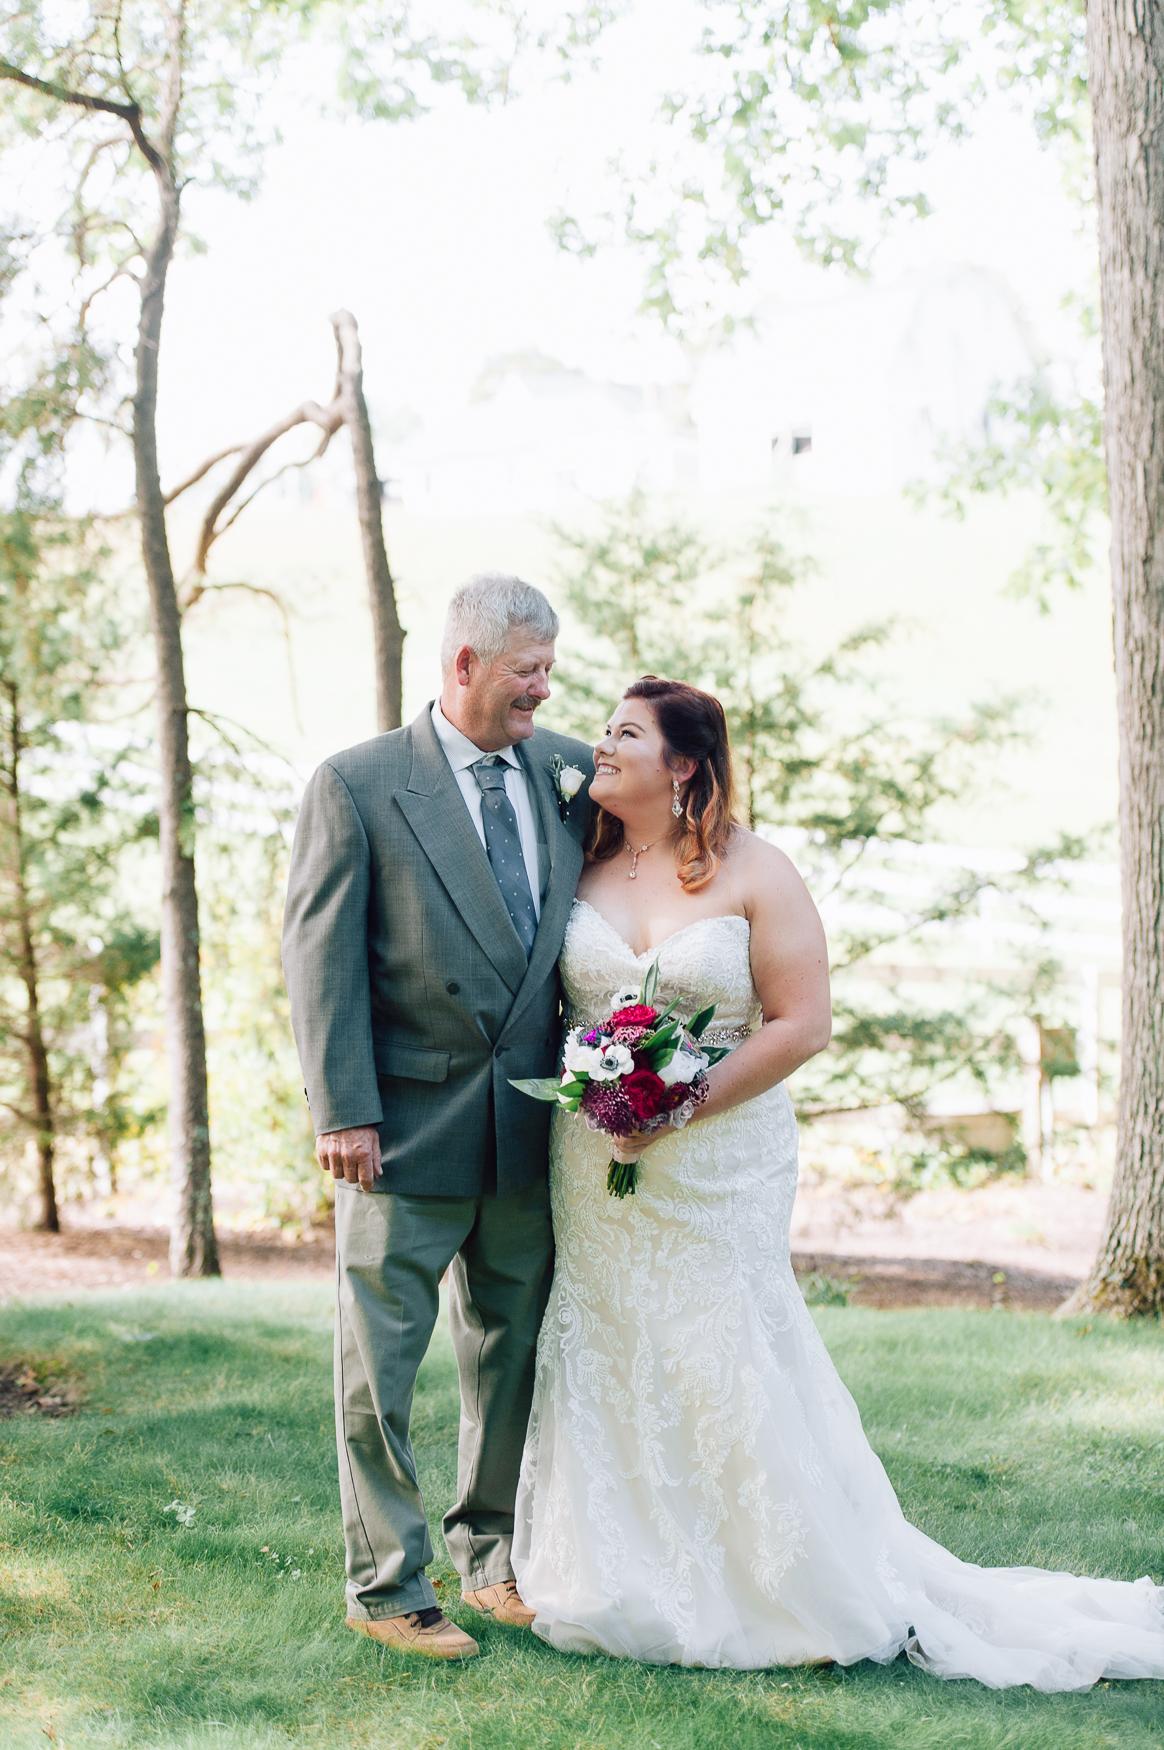 virginiawedding_GlenGarden_rusticwedding_fredericksburg_youseephotography_KellySteven (23).jpg